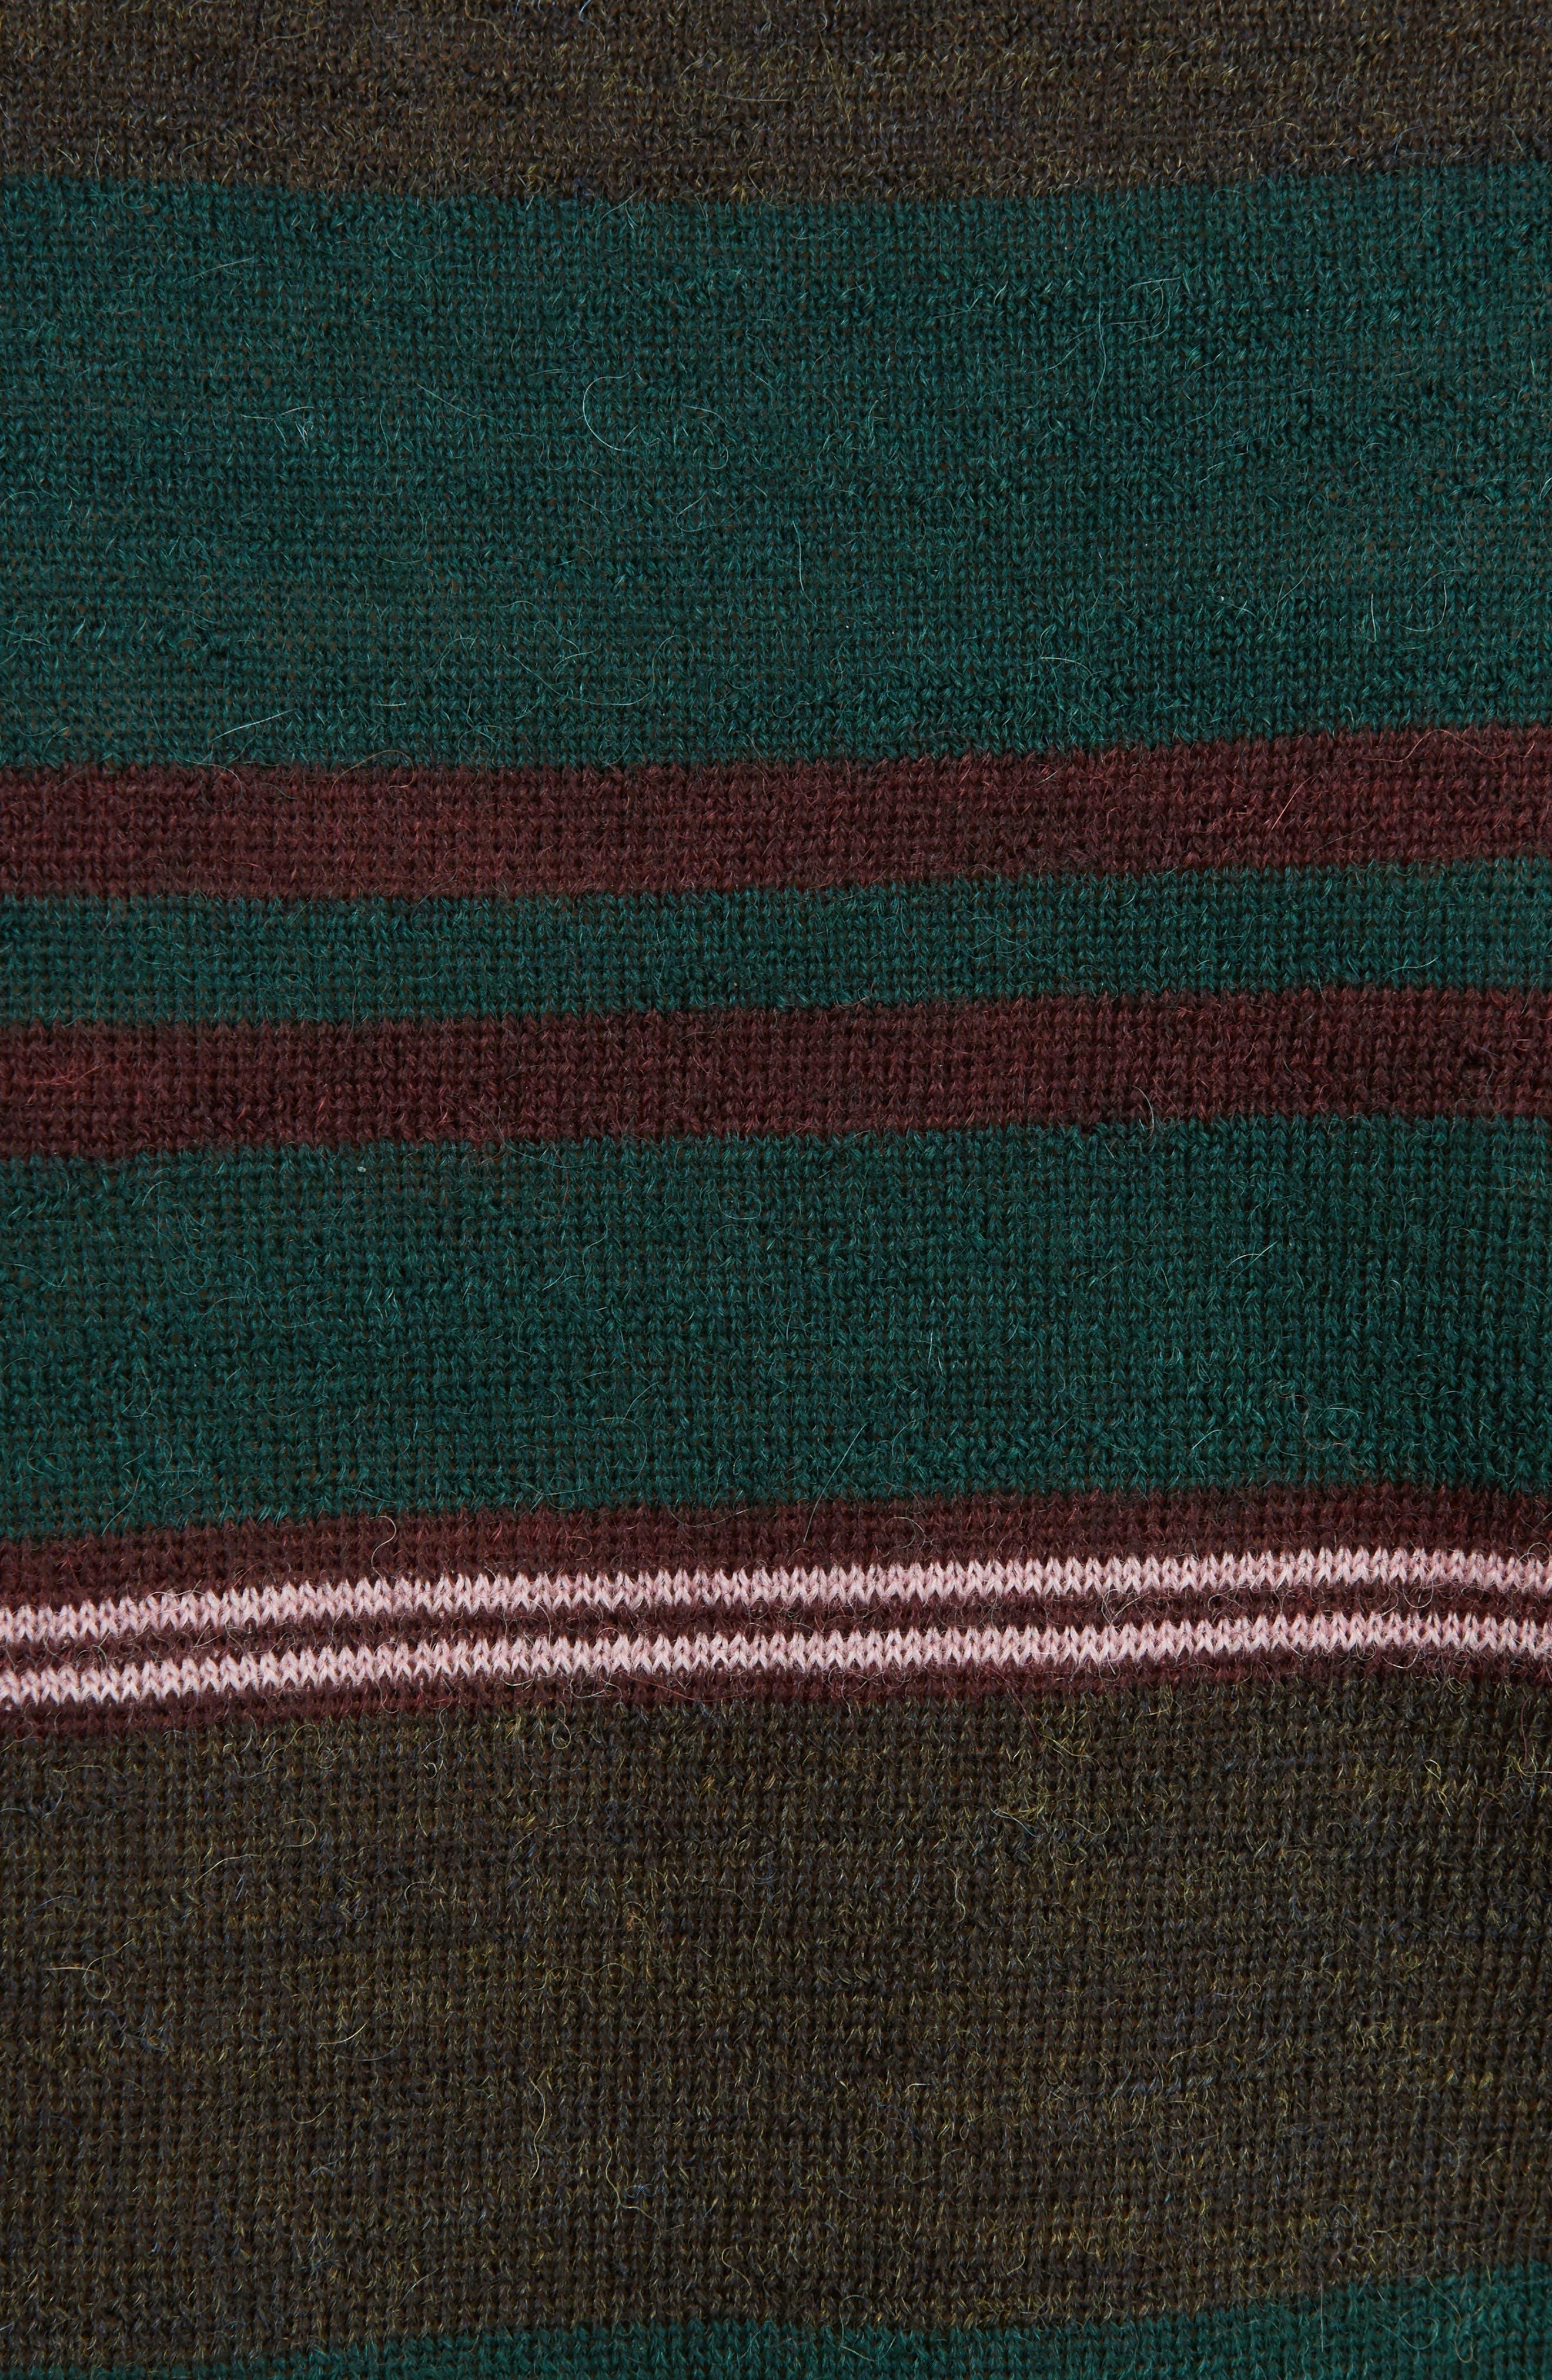 Multistripe Wool Sweater,                             Alternate thumbnail 5, color,                             300